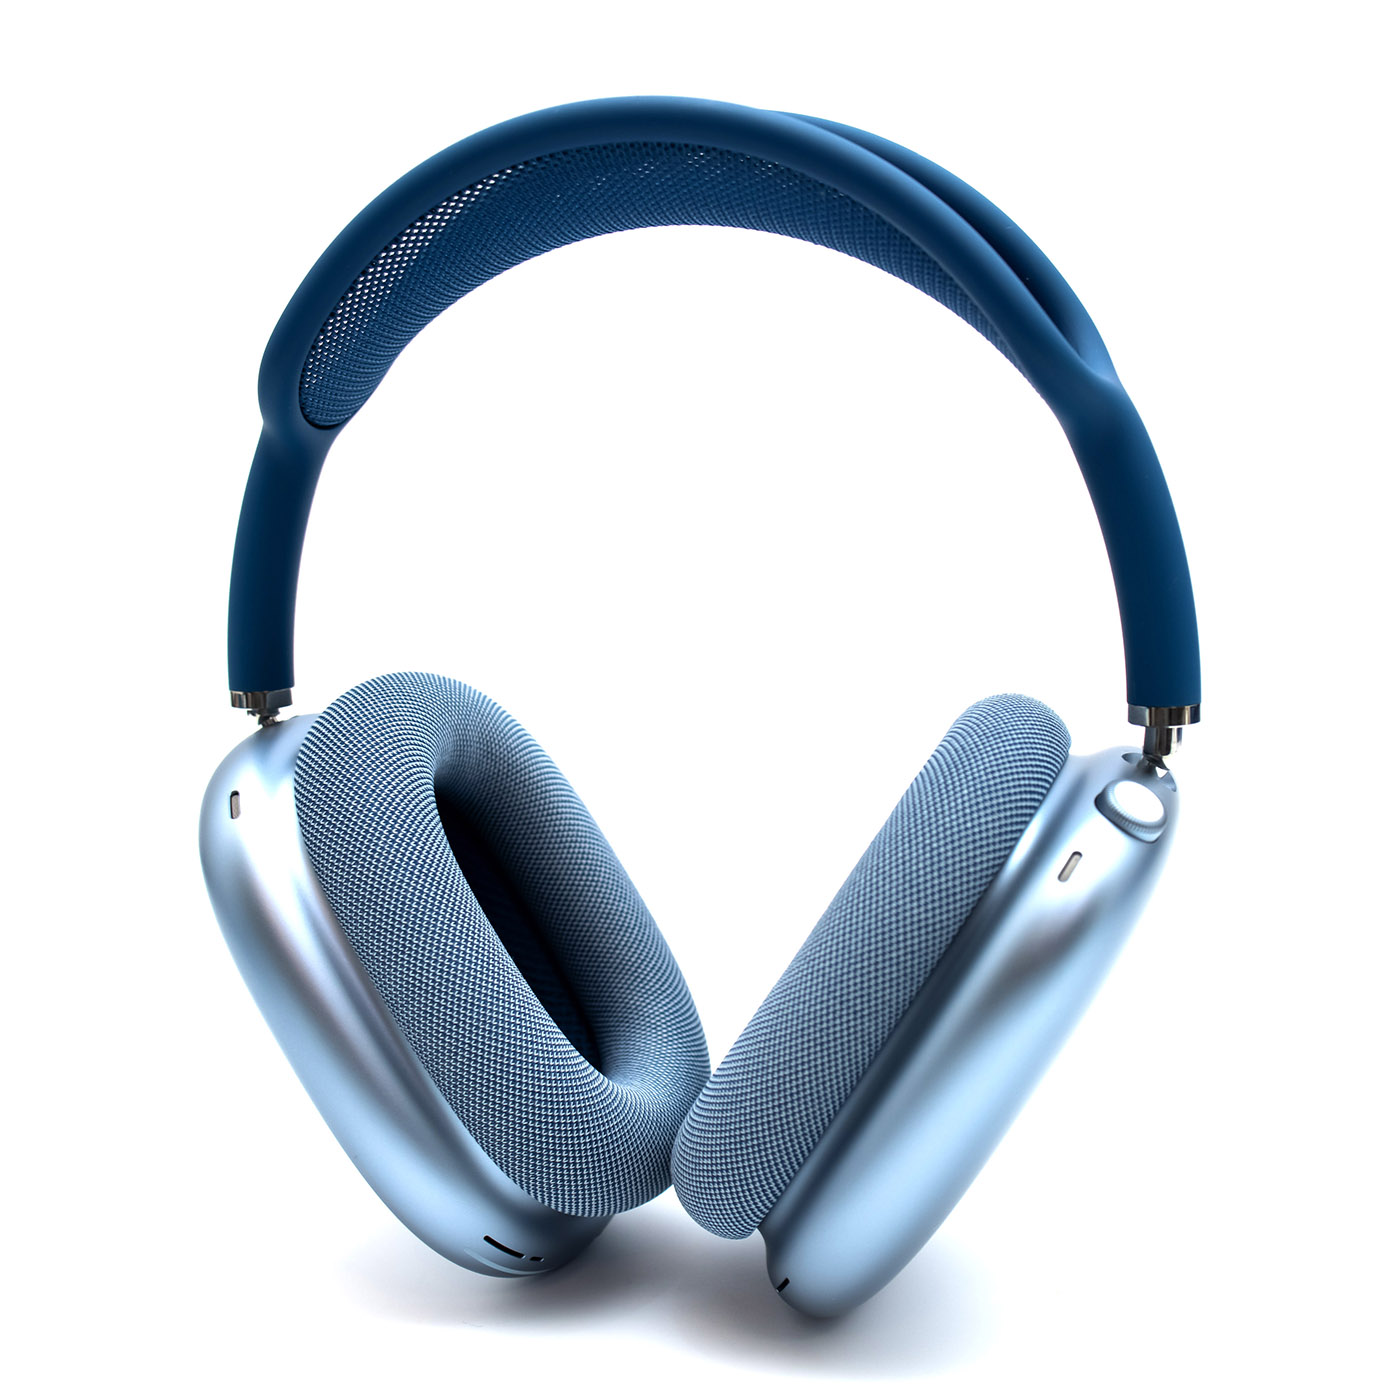 Podcast 頻道:蘋果又出了新的耳機了!這次是耳罩型的降噪耳機 AirPods Max,售價竟然要 18490?阿輝也入手了和大家聊聊到底可不可以買?! Powered by Firstory Hosting